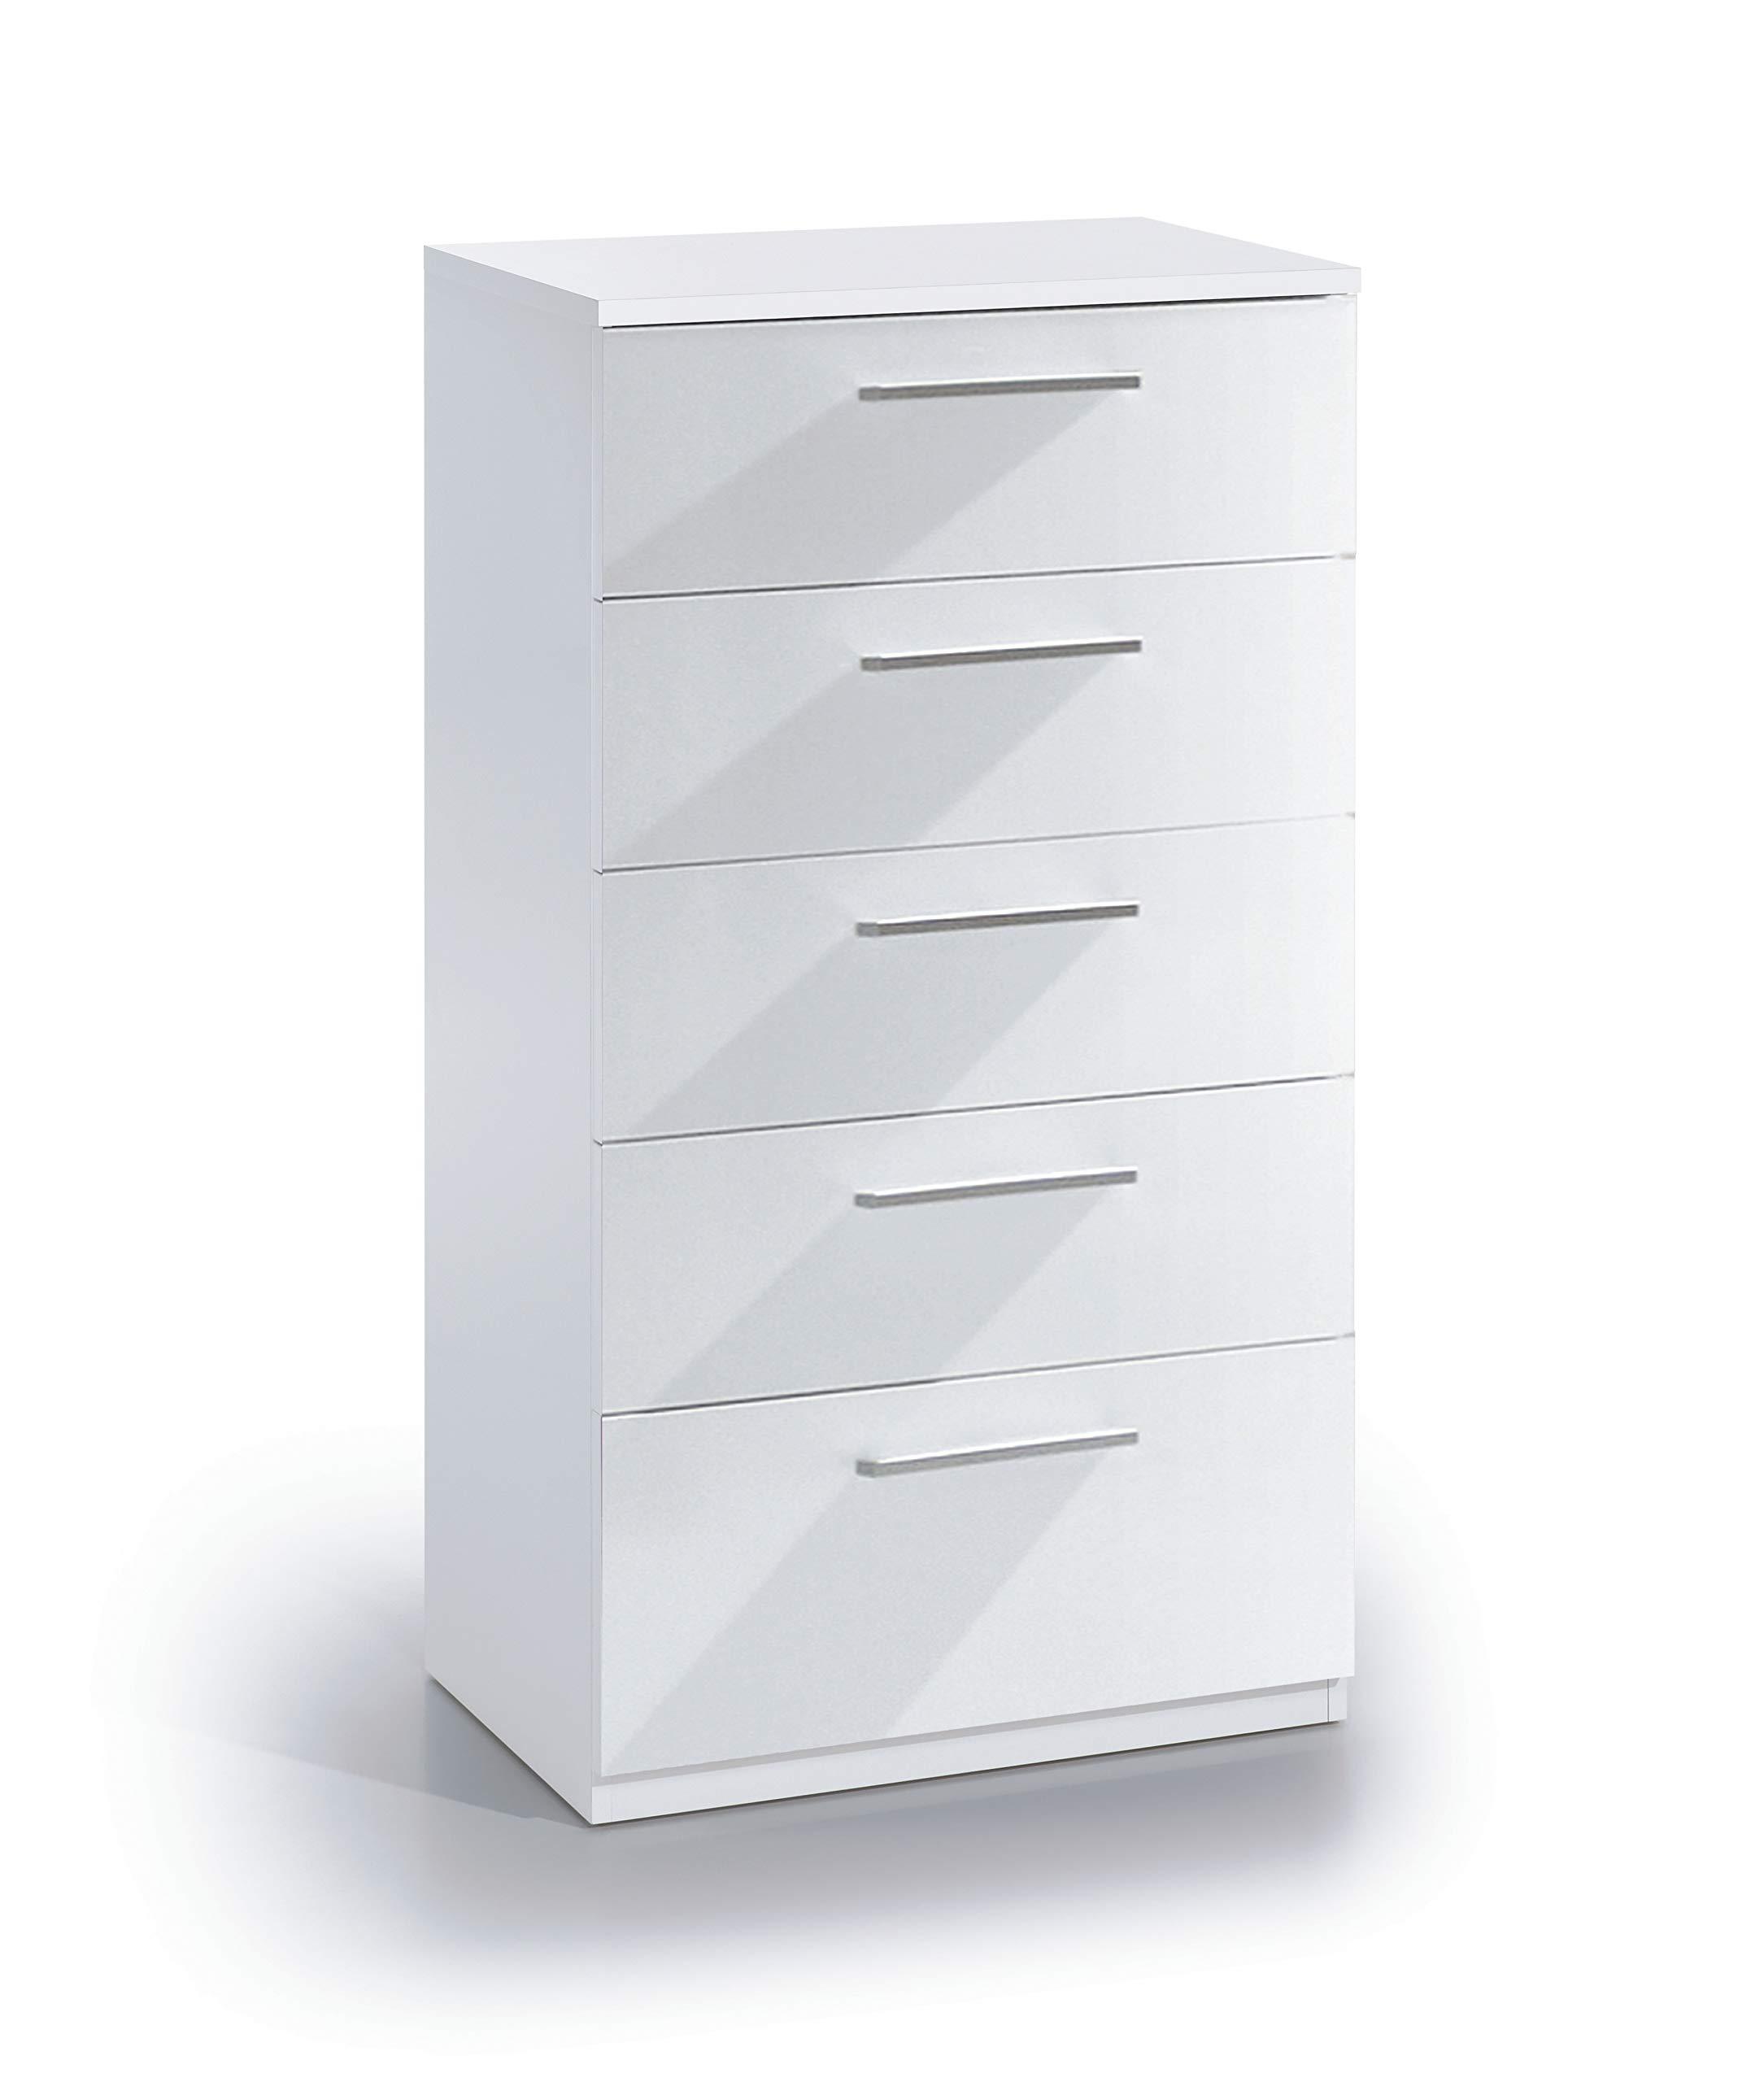 Cassettiere Bianco Lucido.Eglemtek Cassettiera Varsavia Con 5 Cassetti Como